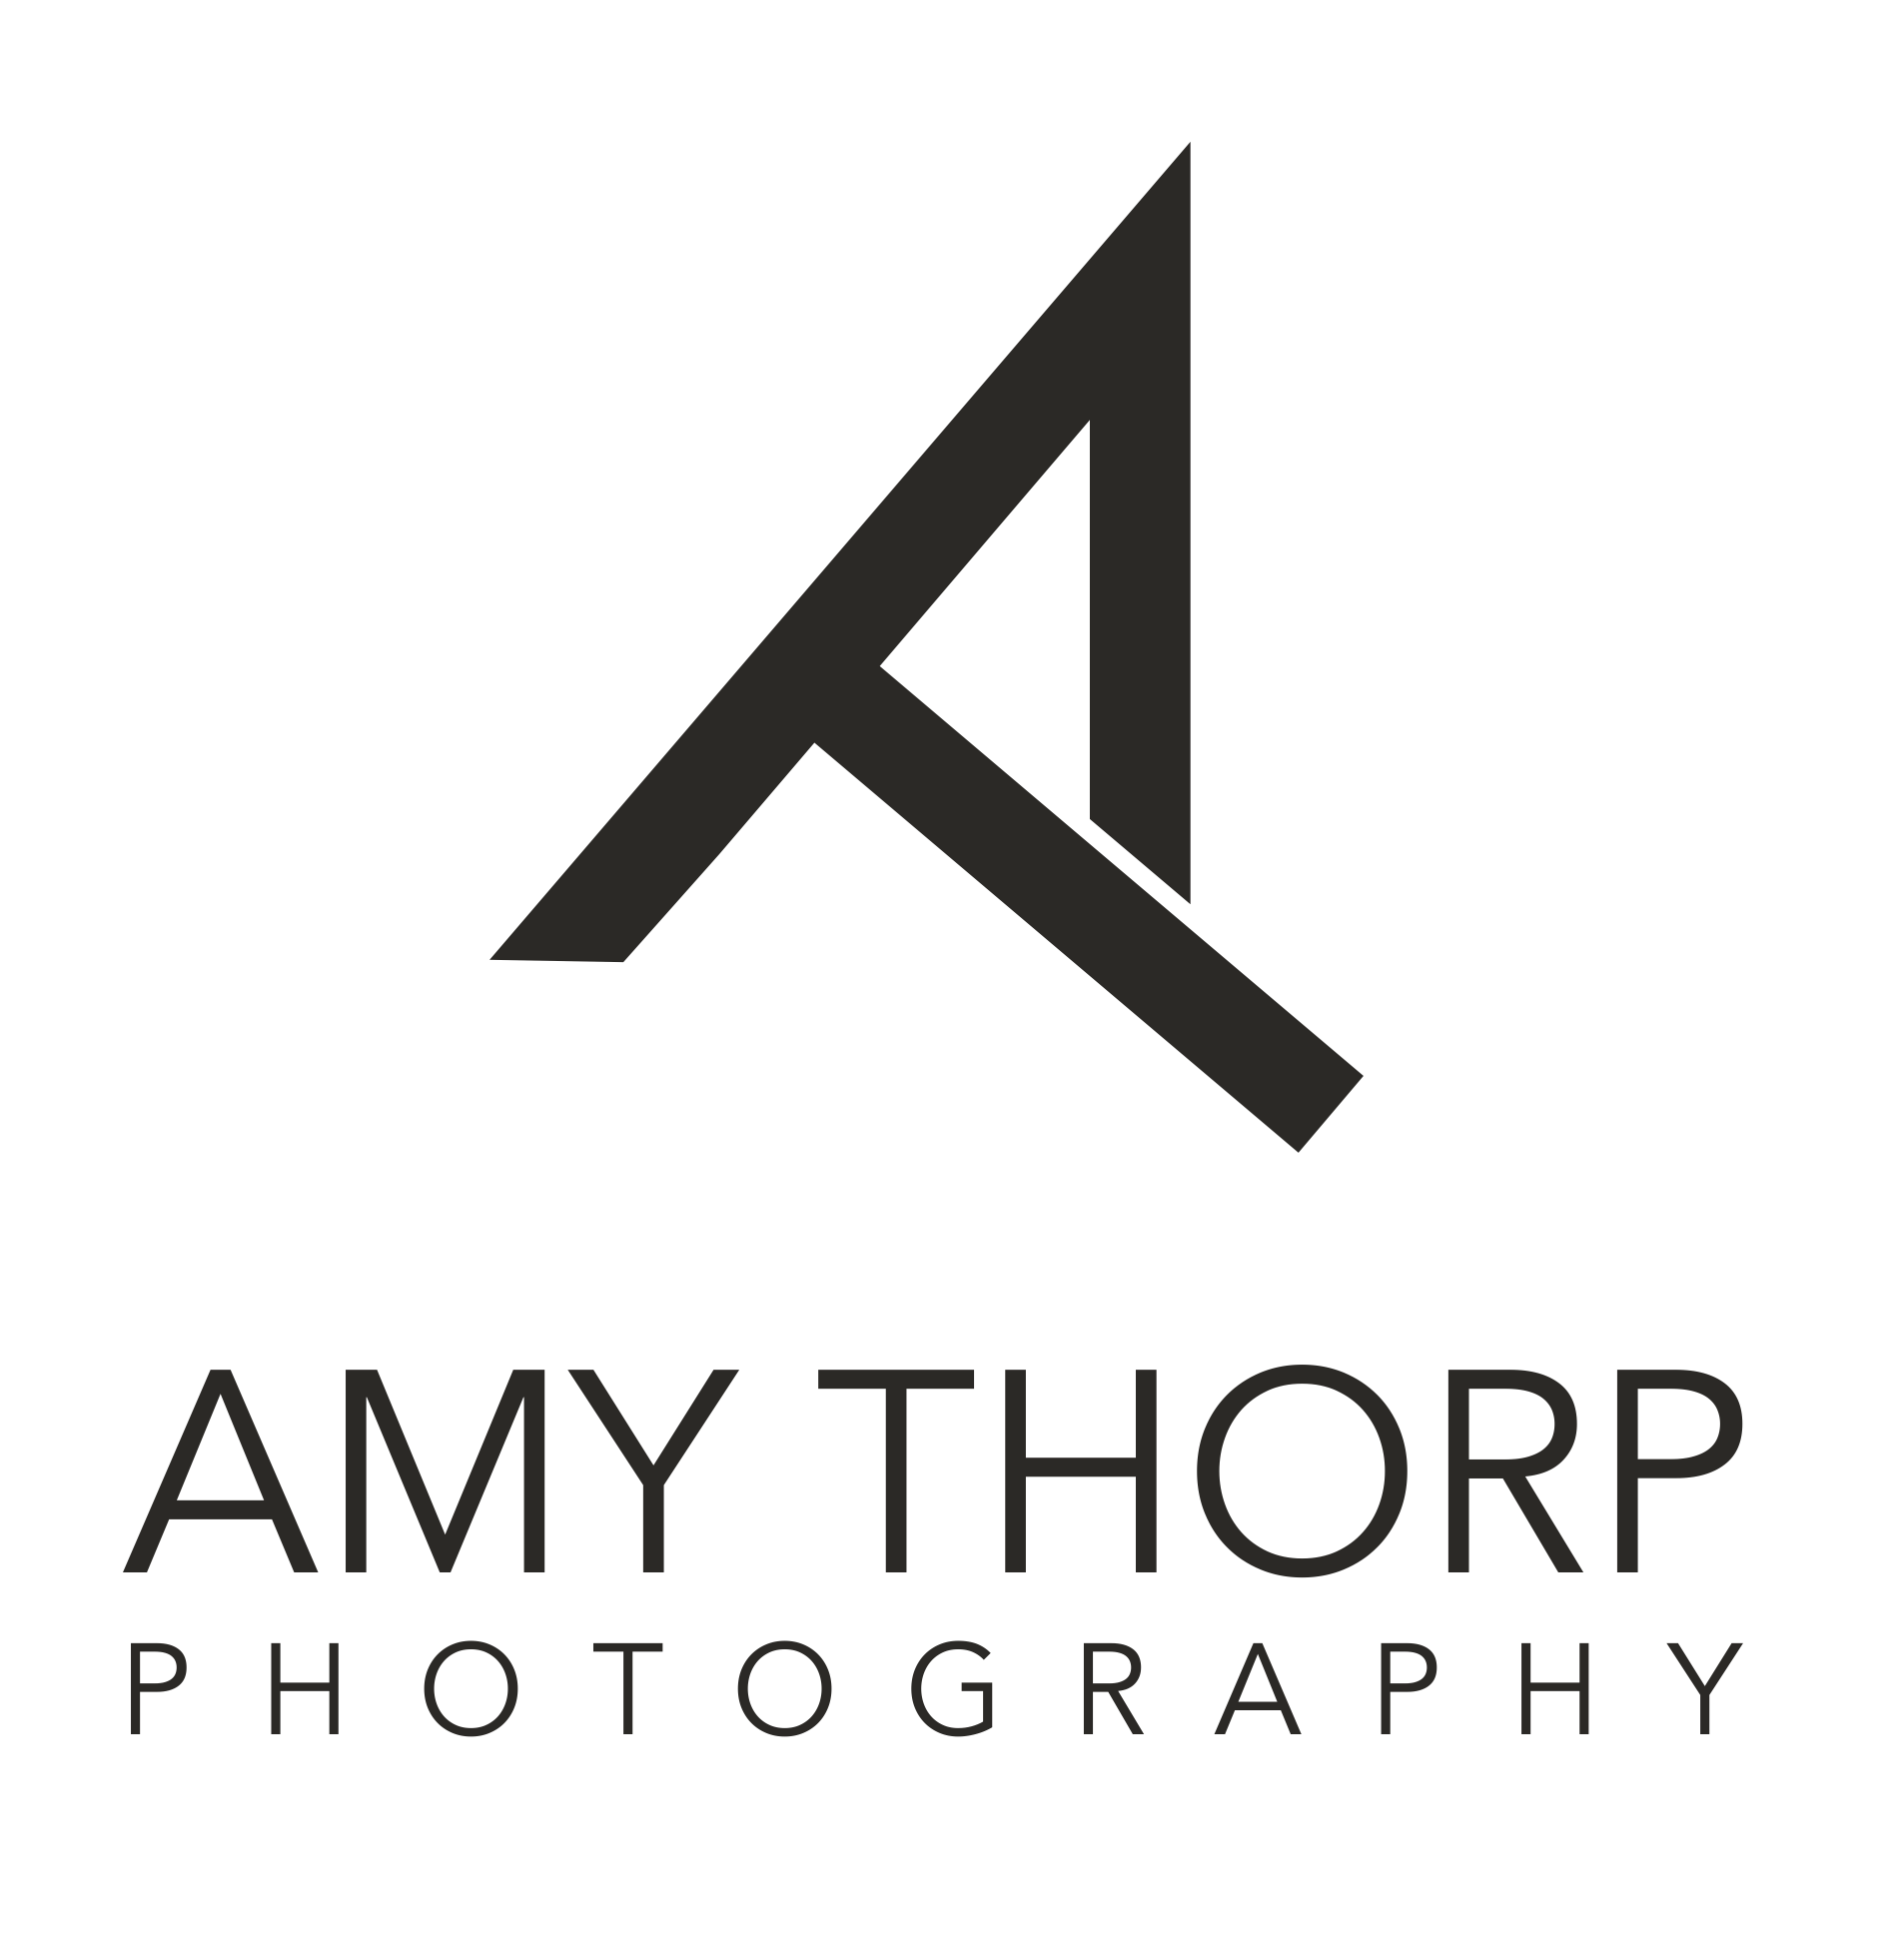 Amy Thorp Photography floor plan in Dorchester Ilderton Komoka London Mount Brydges Ontario St. Thomas Strathroy